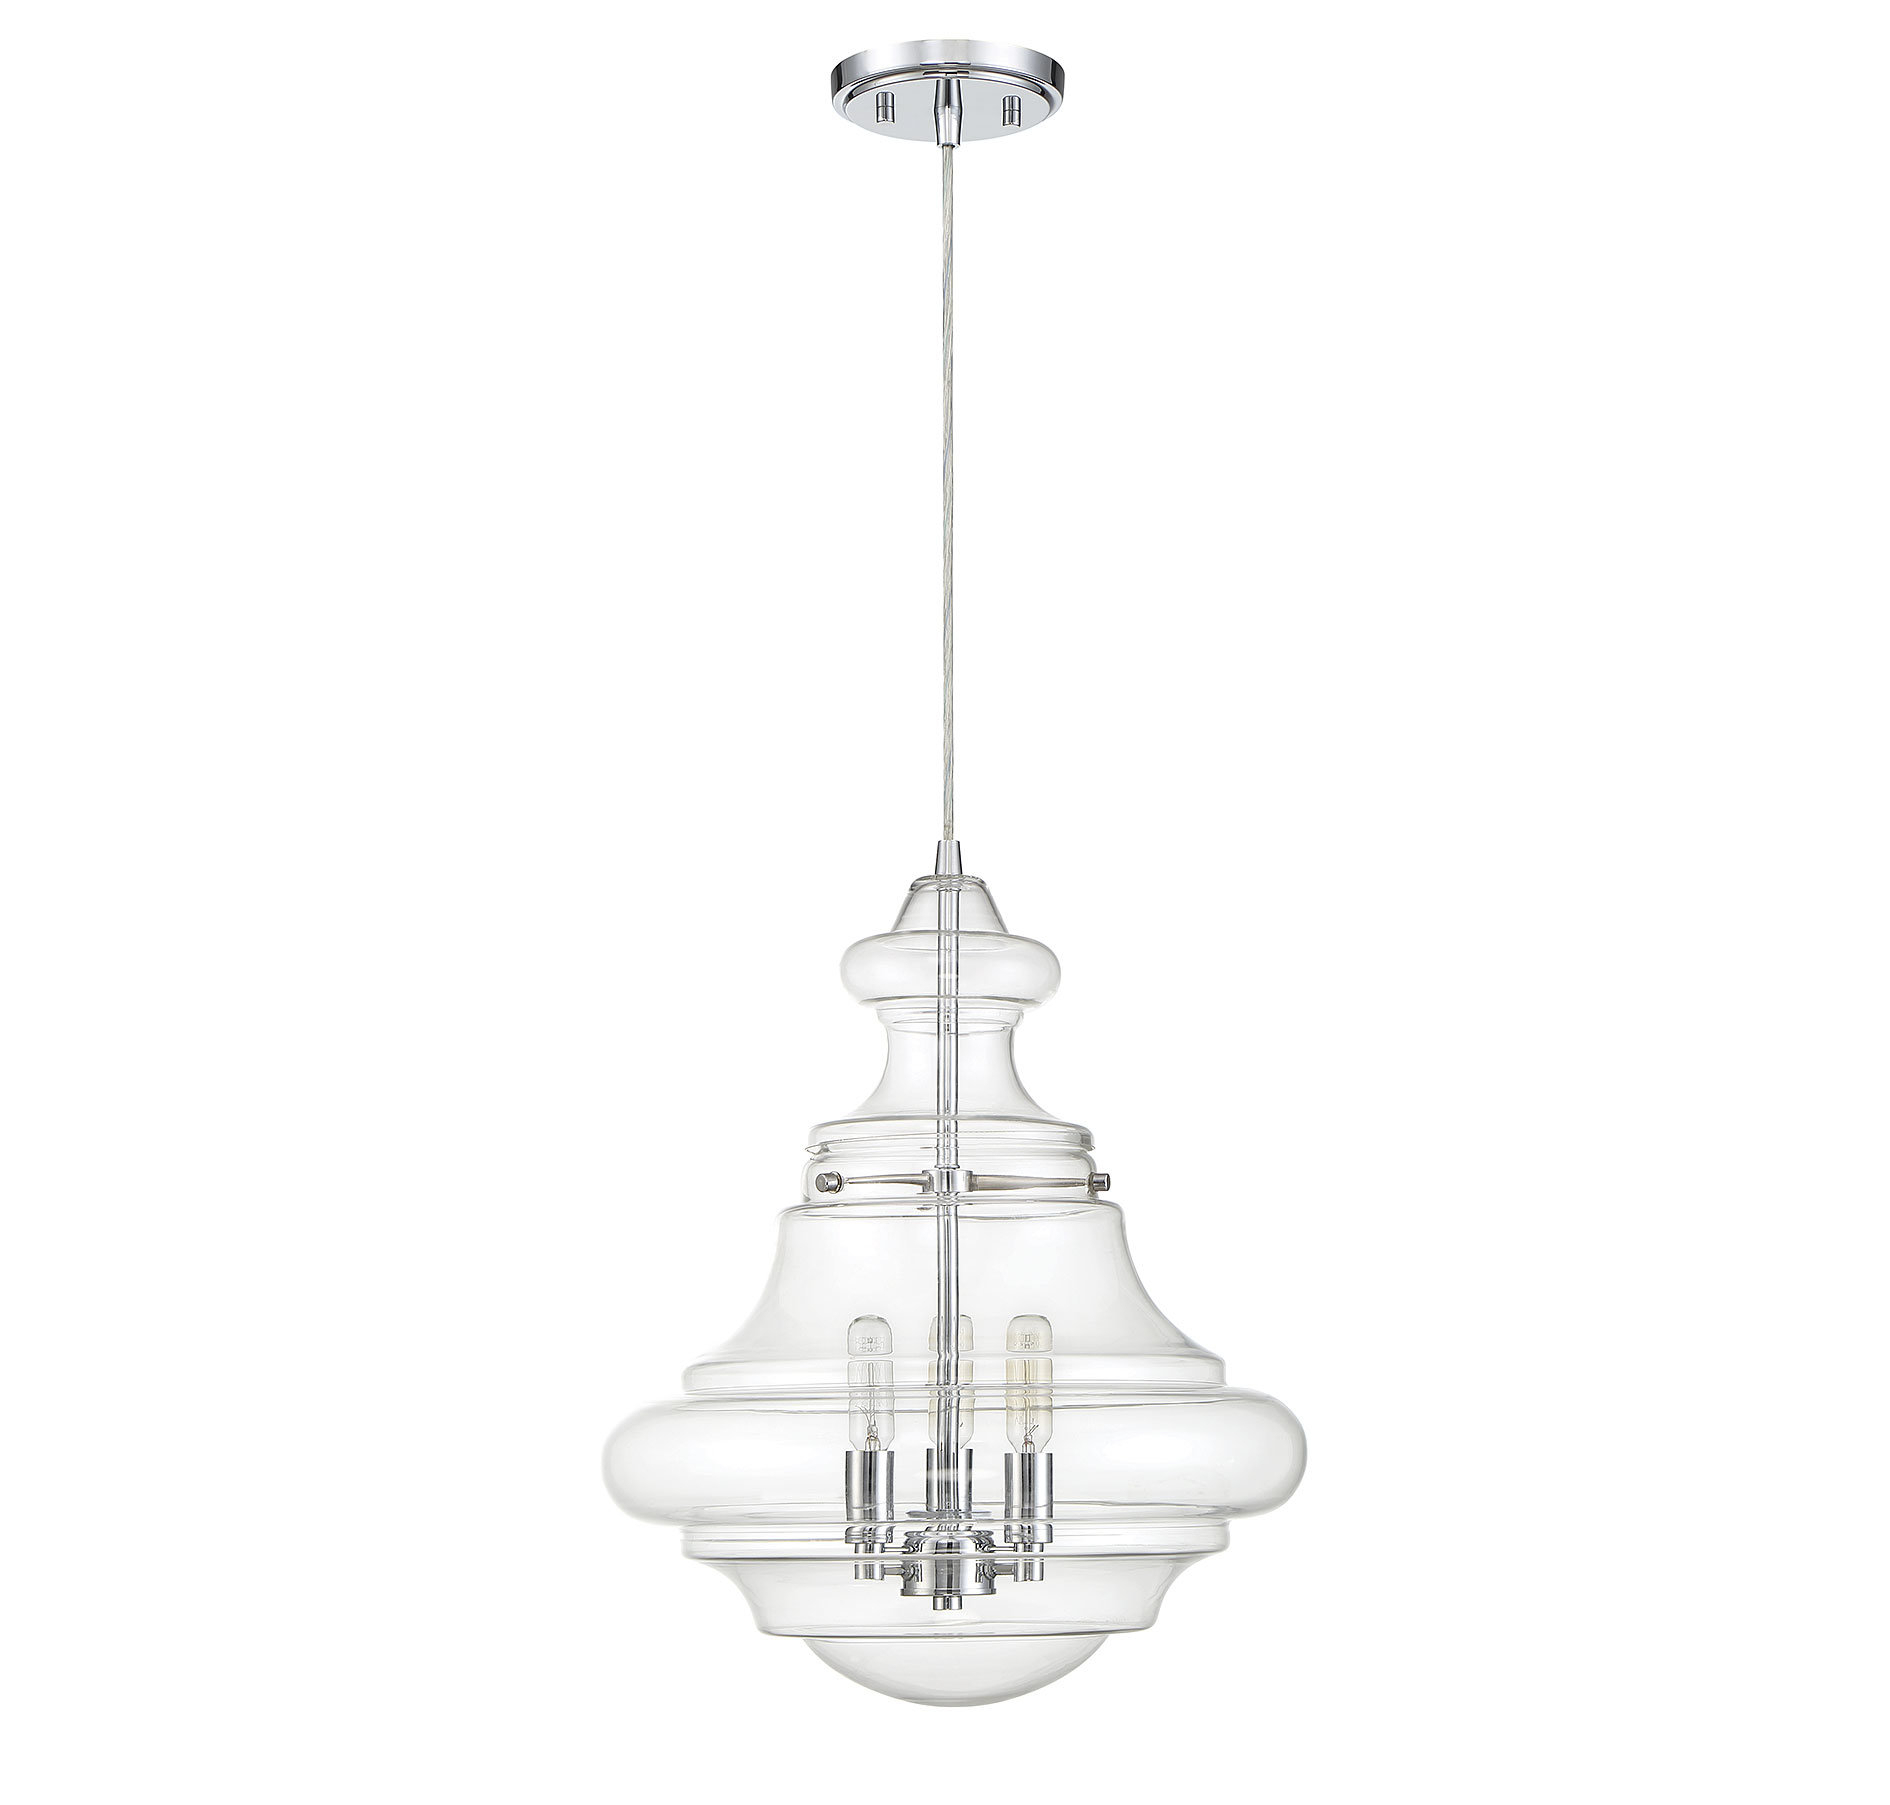 Edford 3 Light Single Schoolhouse Pendant Regarding Akakios 1 Light Single Bell Pendants (Image 13 of 30)